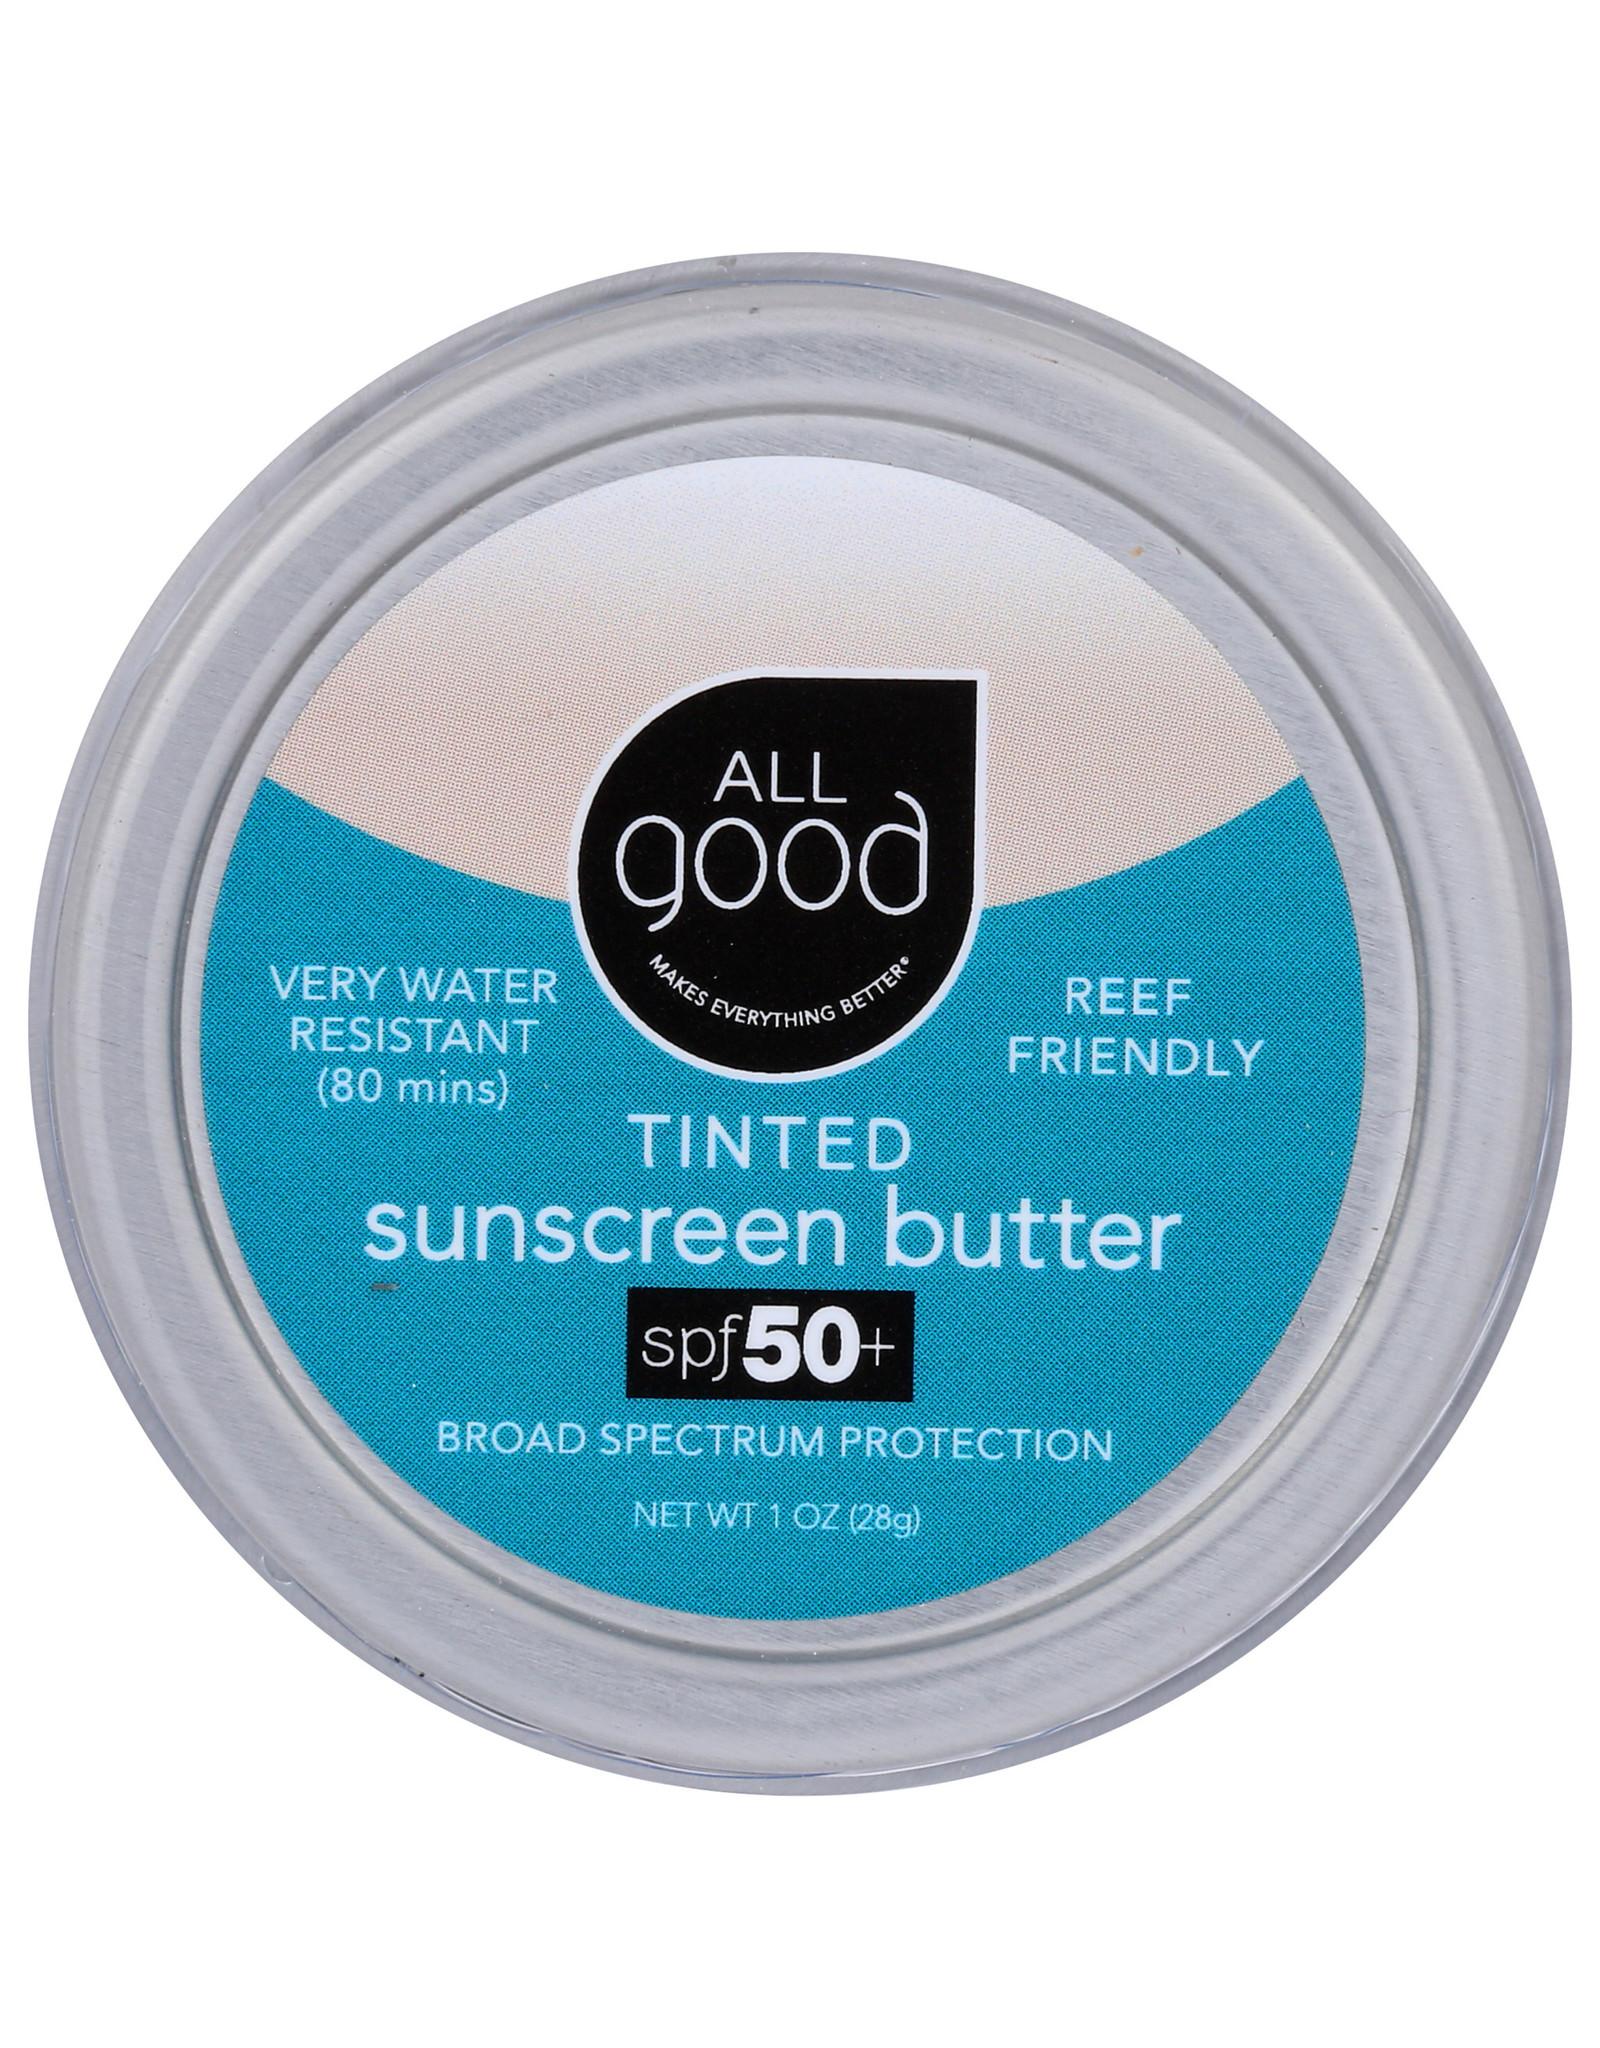 All Good Tinted Sunscreen Butter